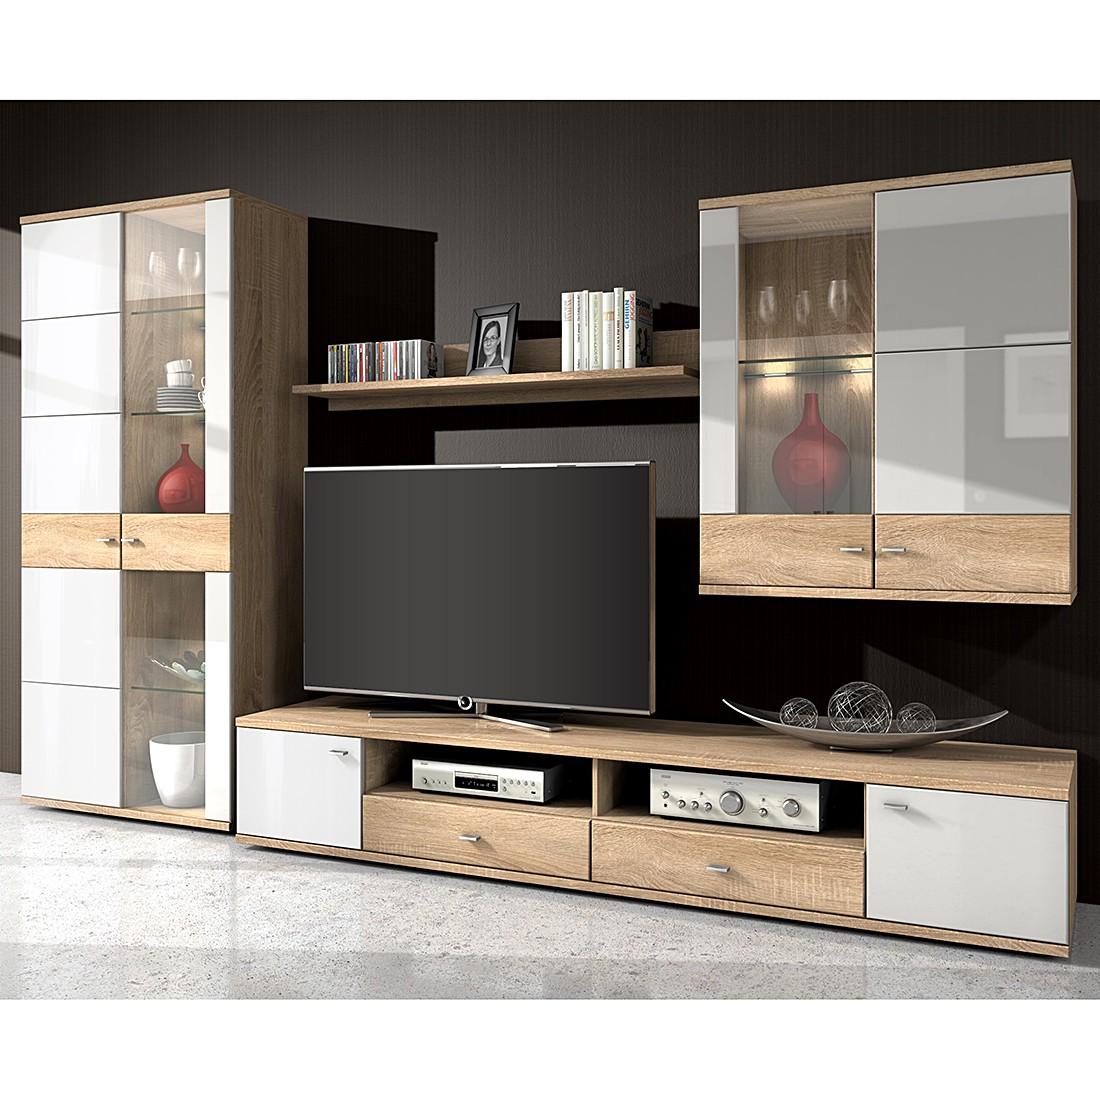 eek a wohnwand winnipeg 4 teilig inklusive beleuchtung. Black Bedroom Furniture Sets. Home Design Ideas